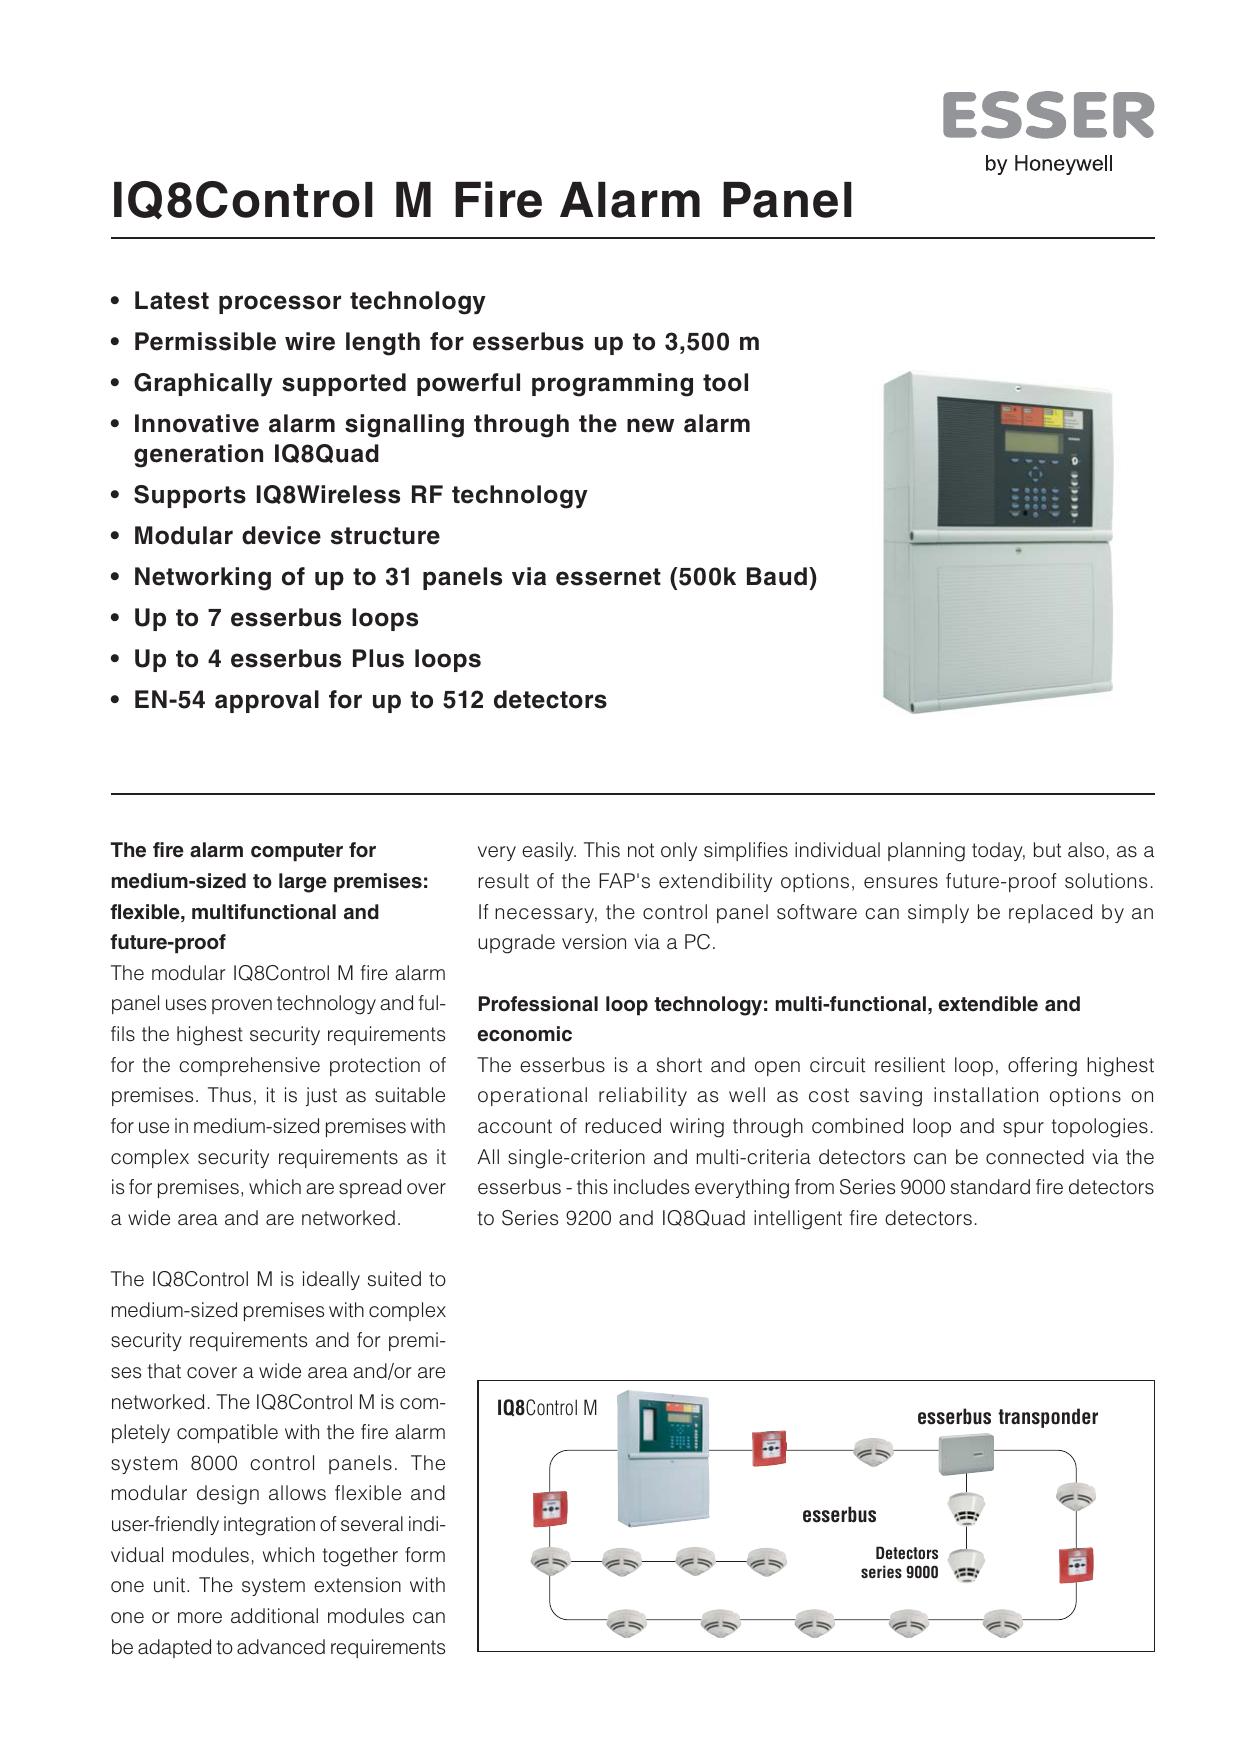 Iq8control M Fire Alarm Panel Intelligent System Schematic Diagram